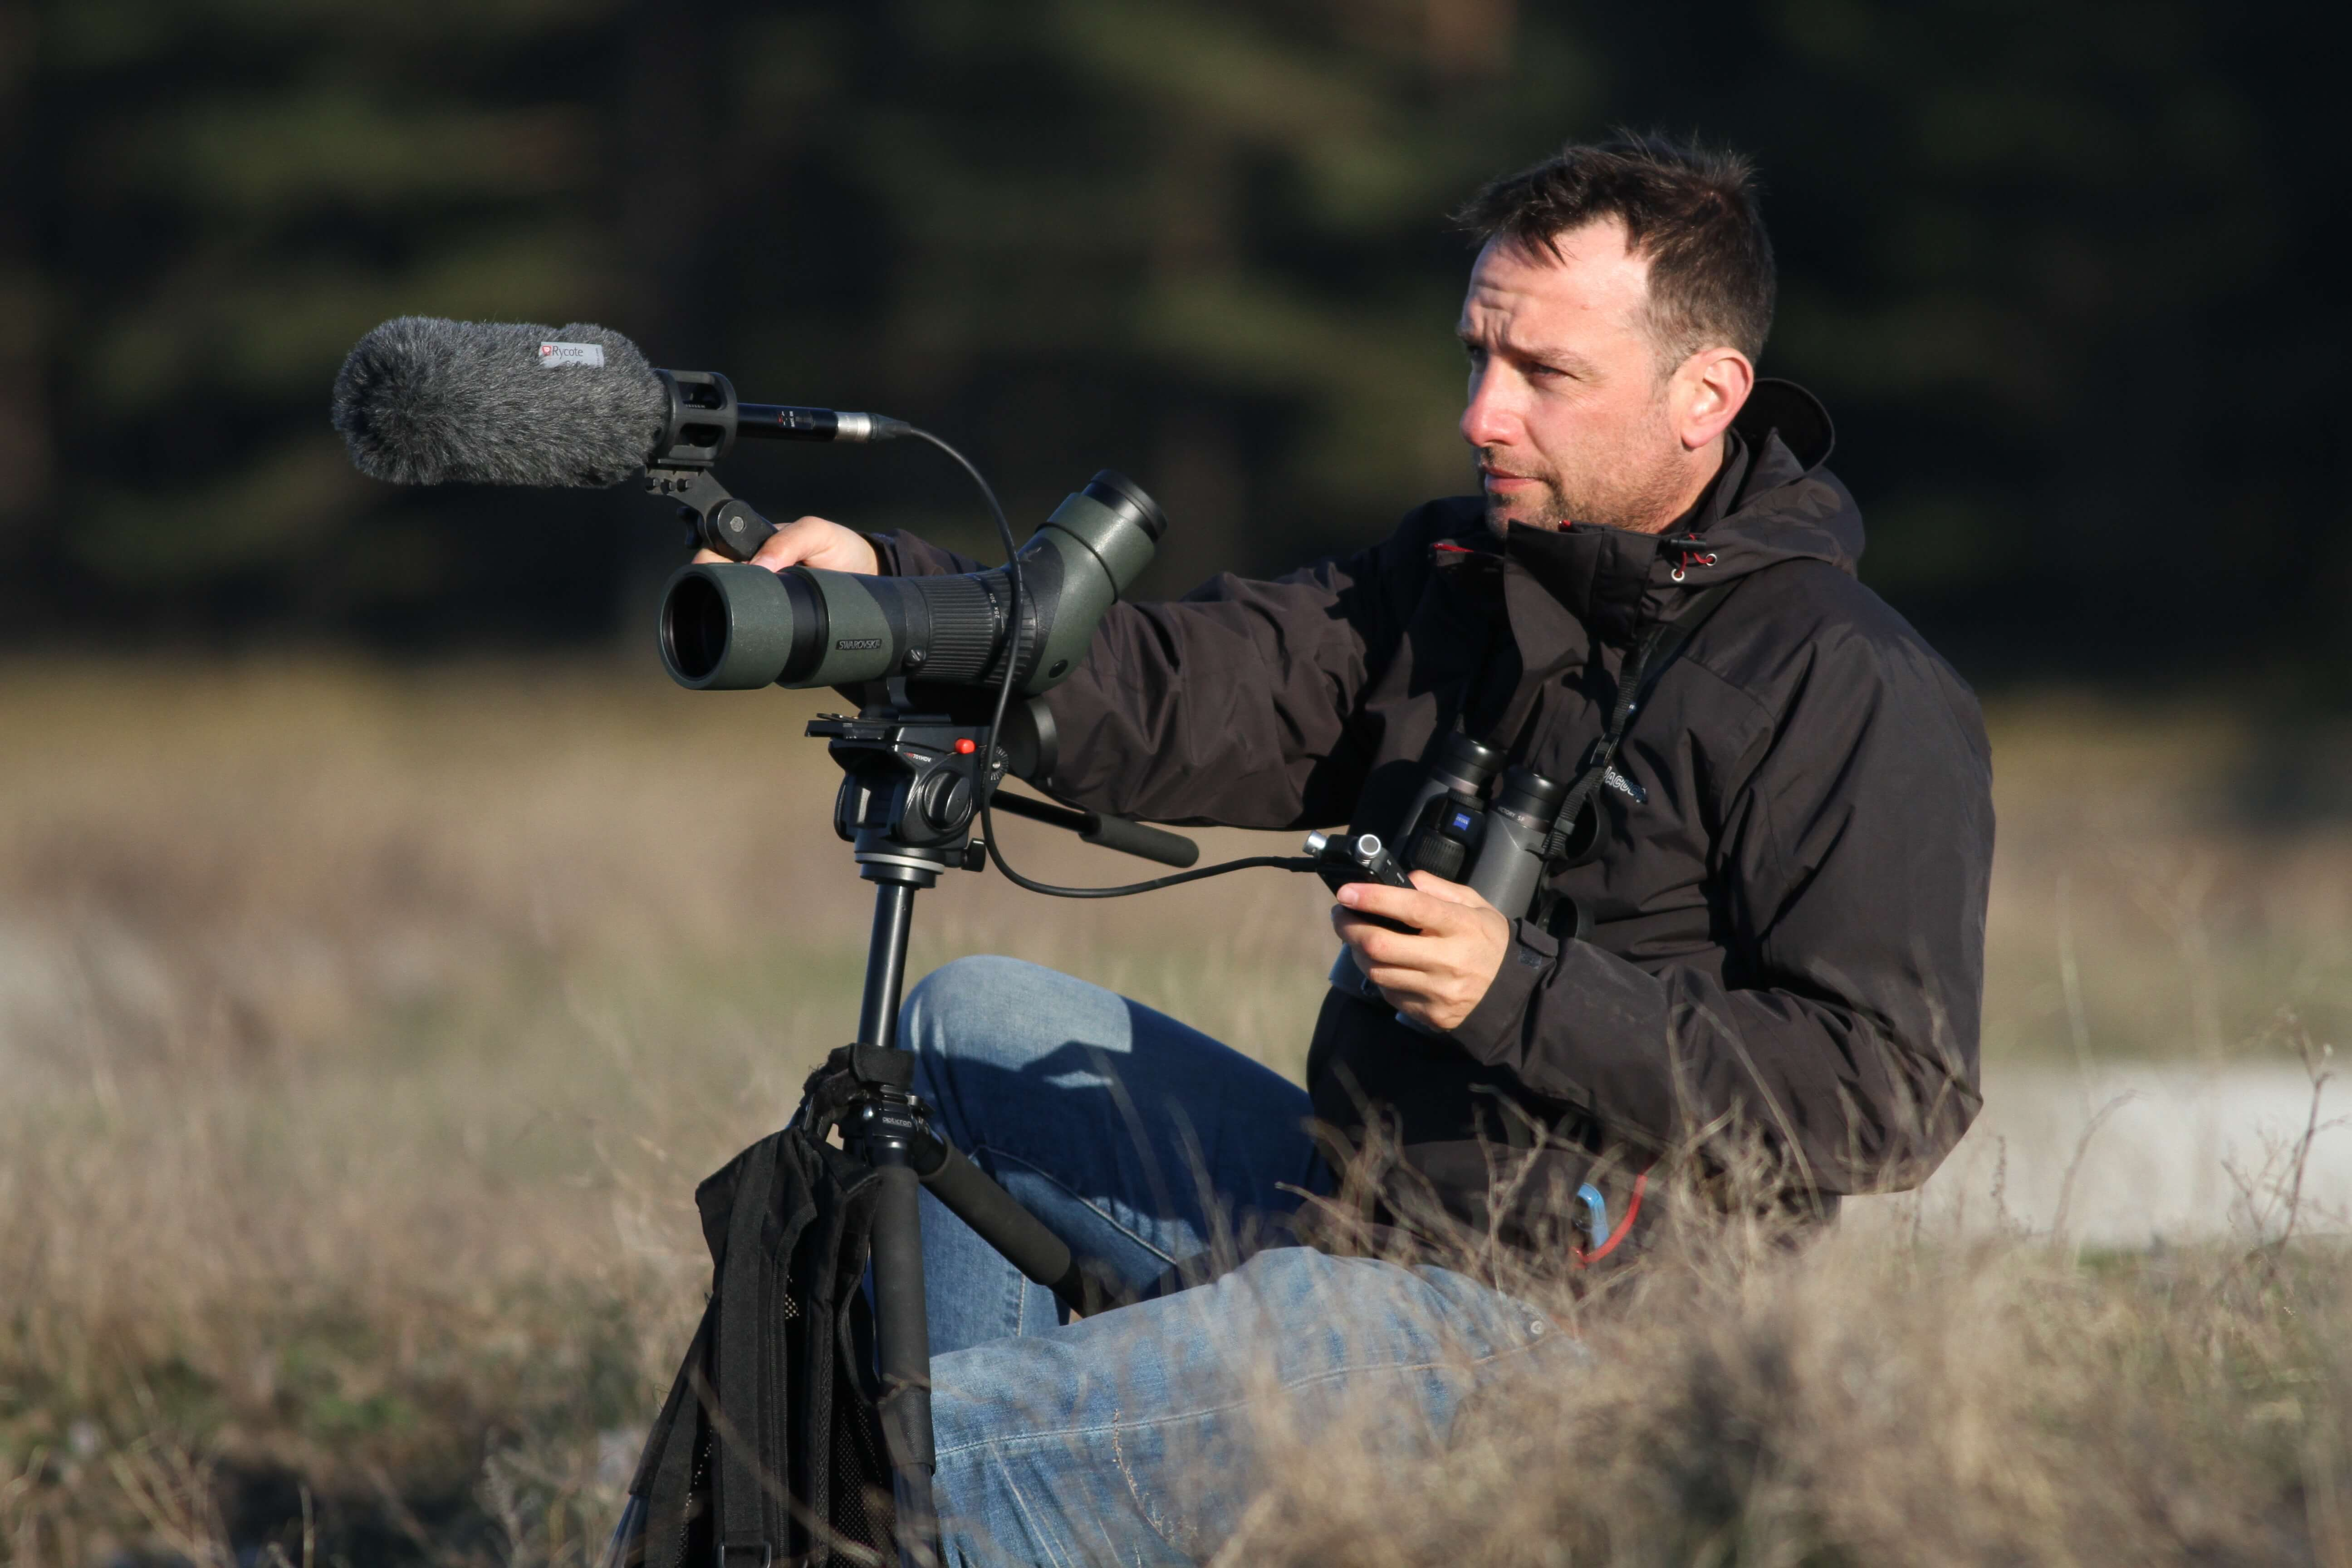 James Lidster TBD team dutch birding